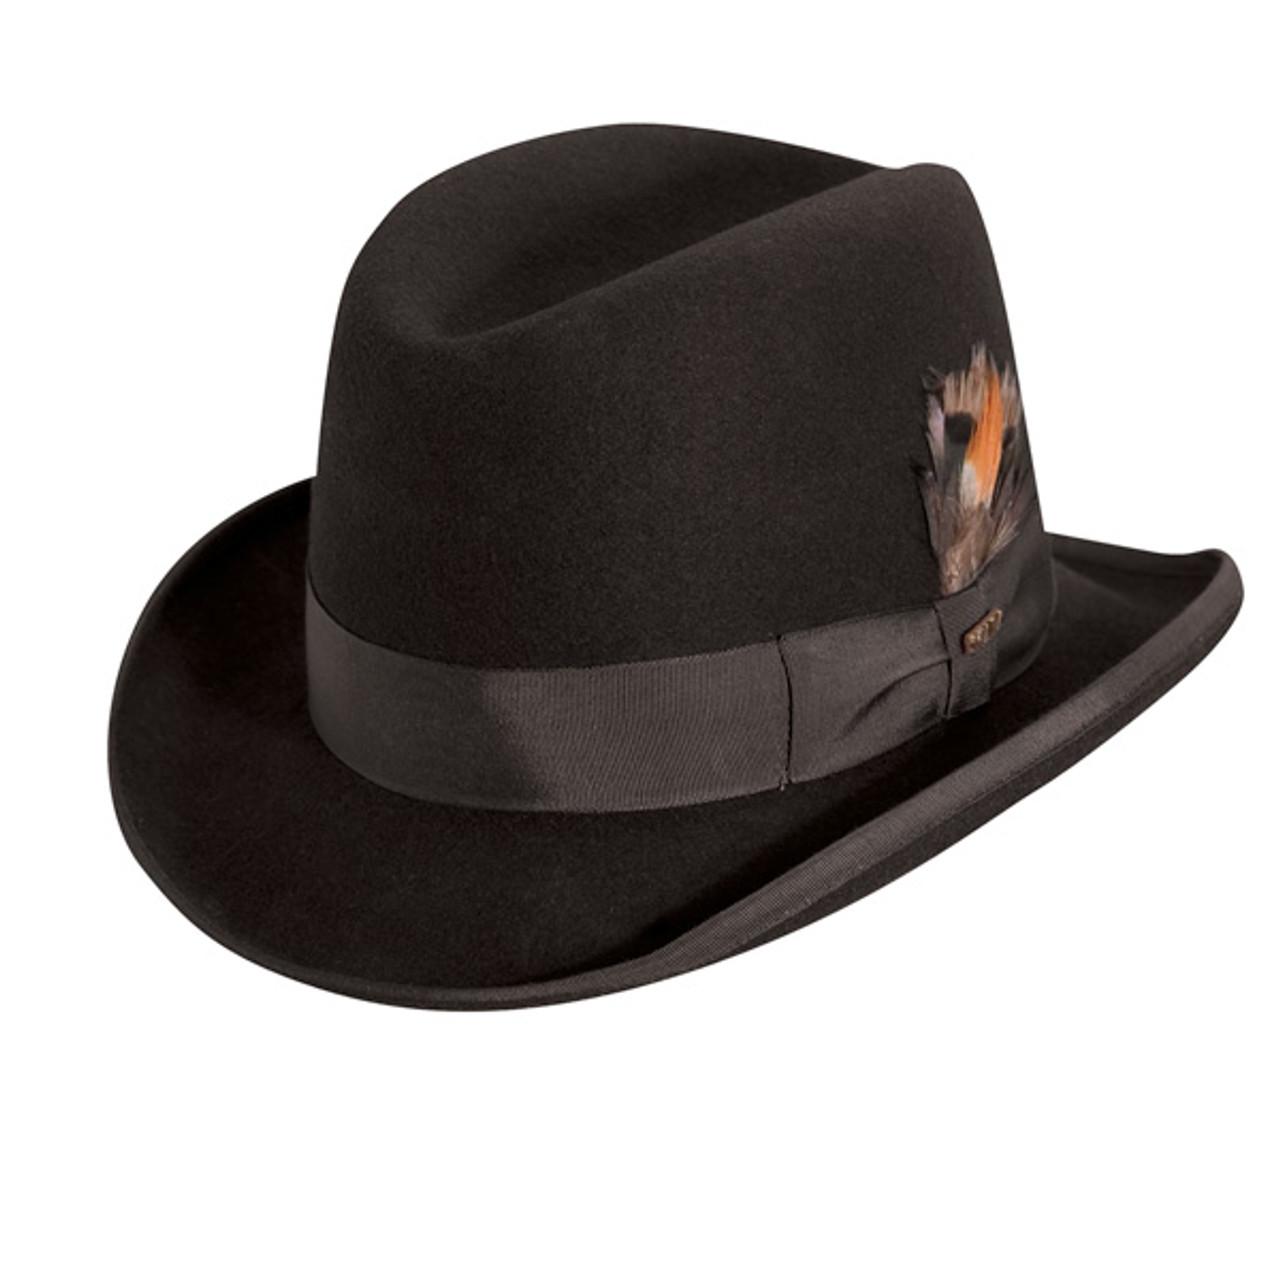 57daf99d764 Scala. Scala - Homburg Wool Felt Godfather Hat